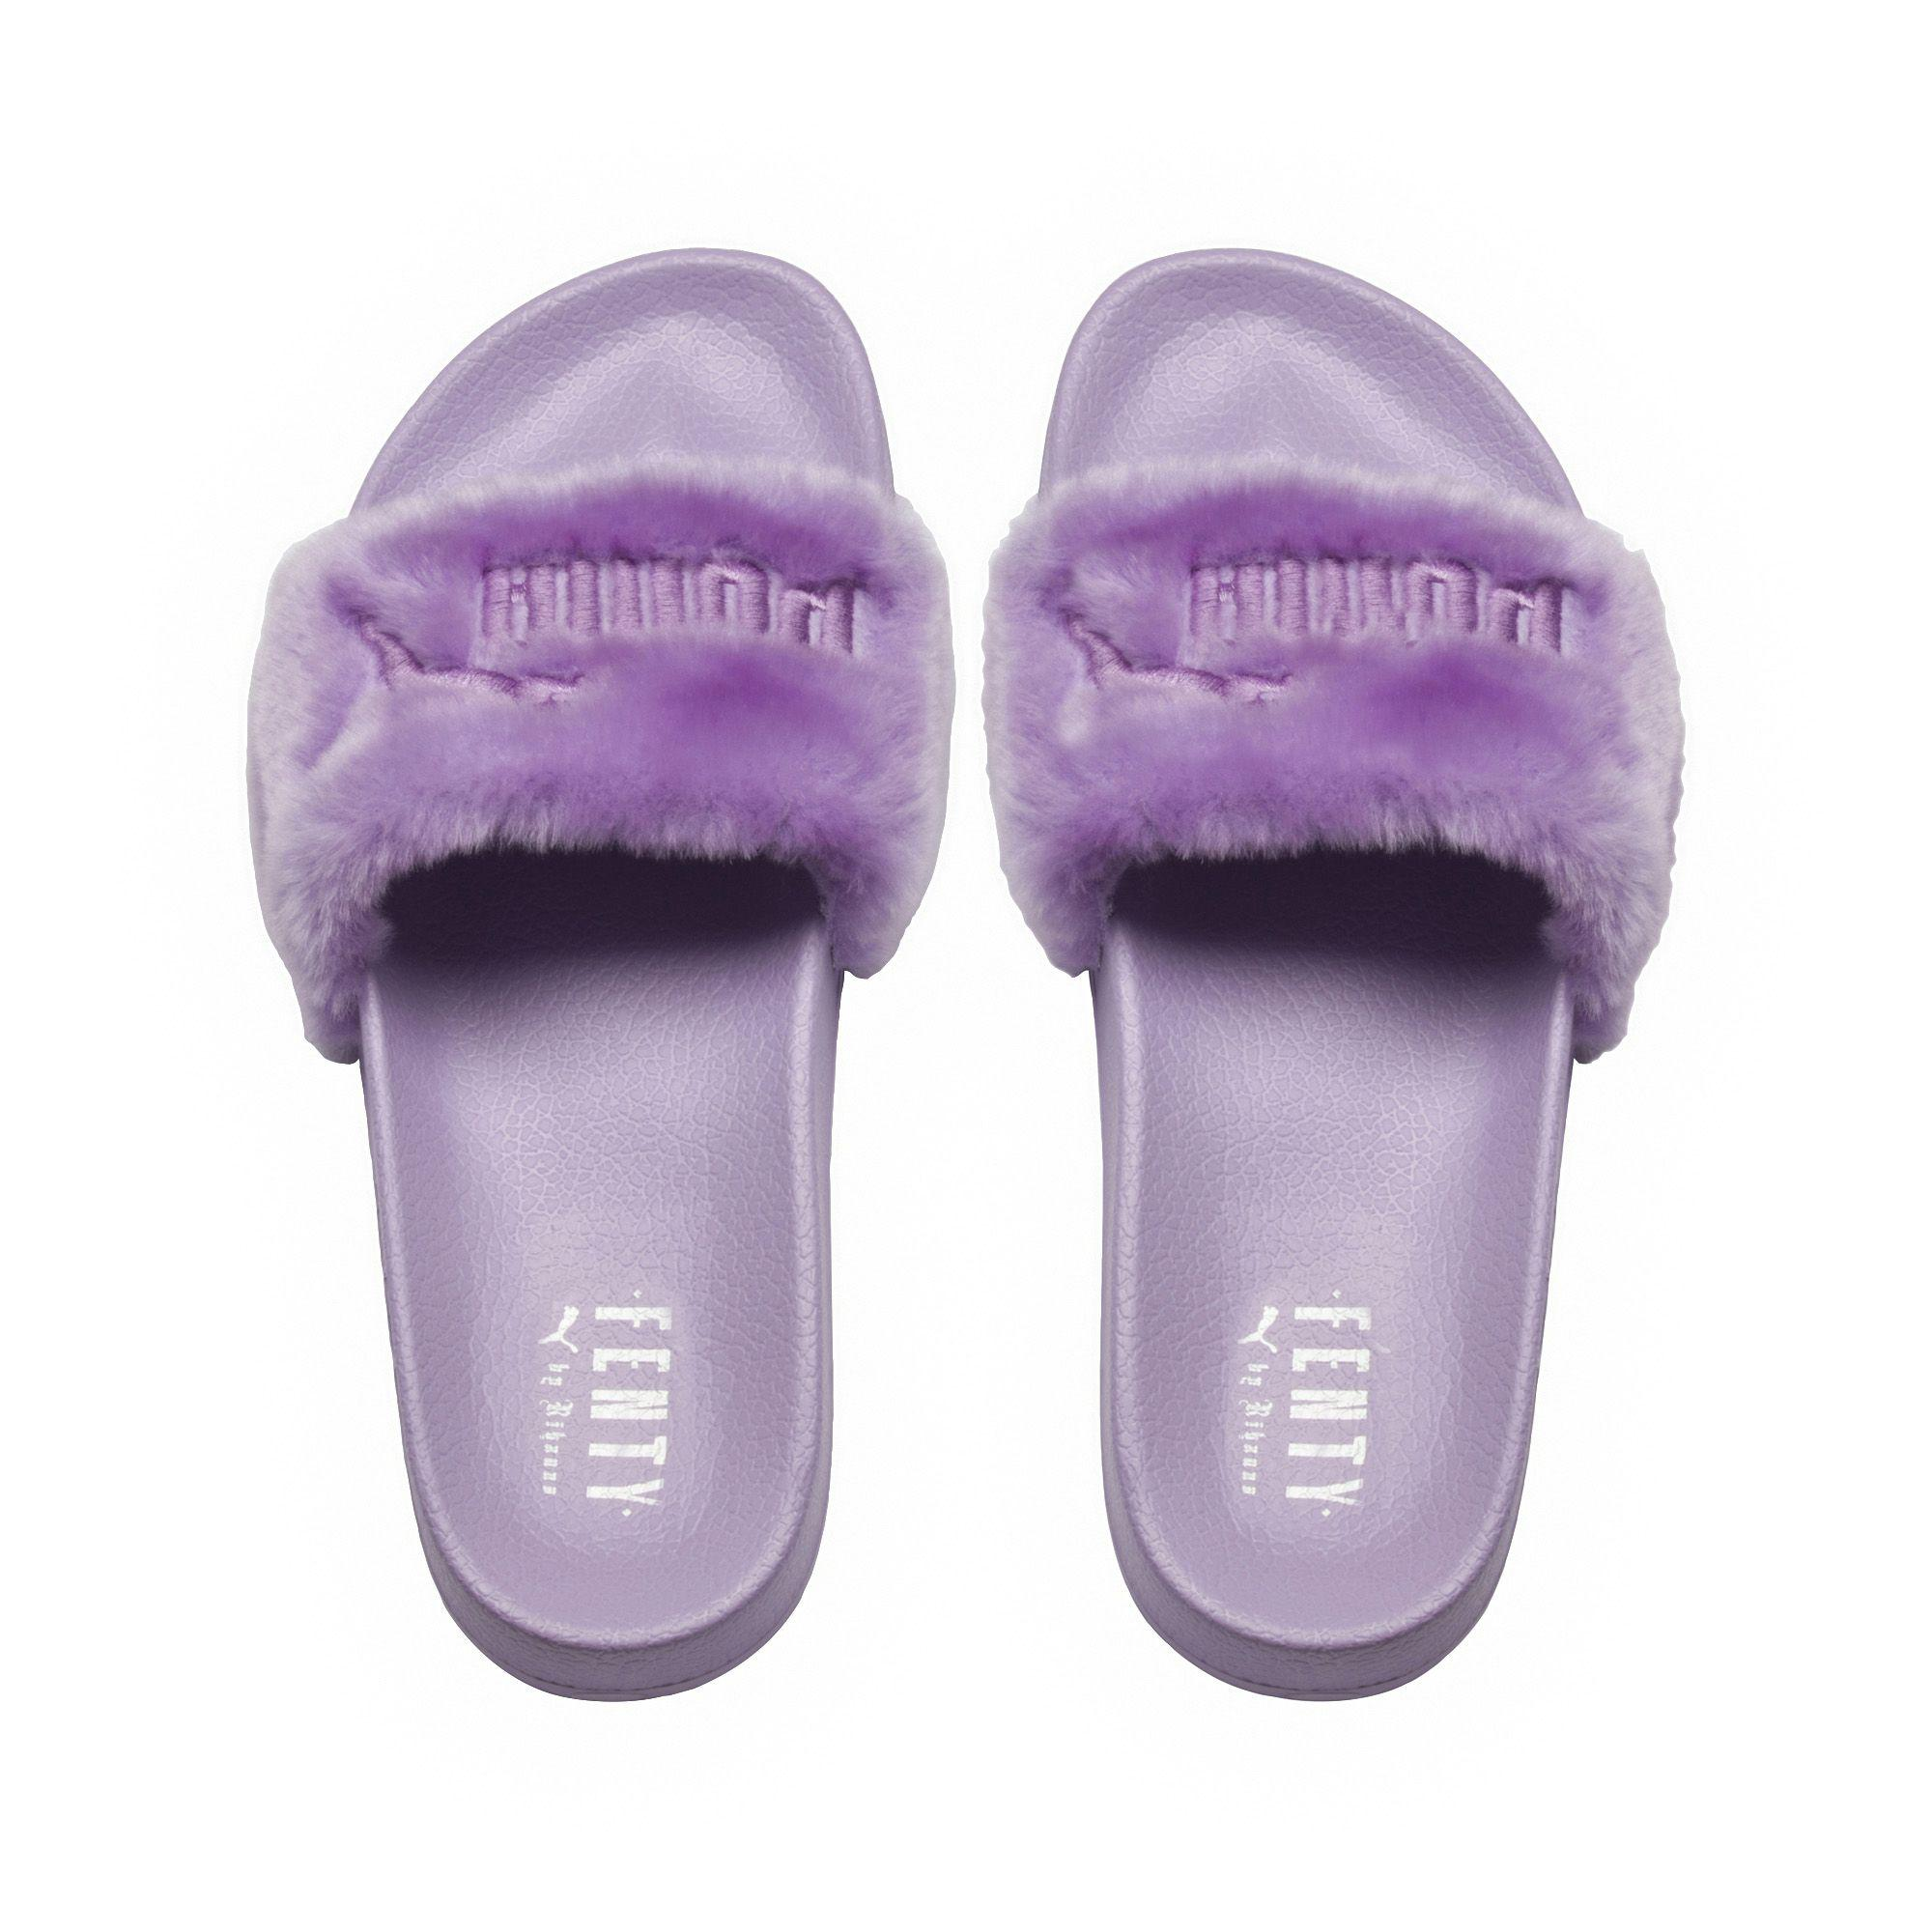 new styles 096e2 1dc04 Purple Fenty Fur Men's Slide Sandals